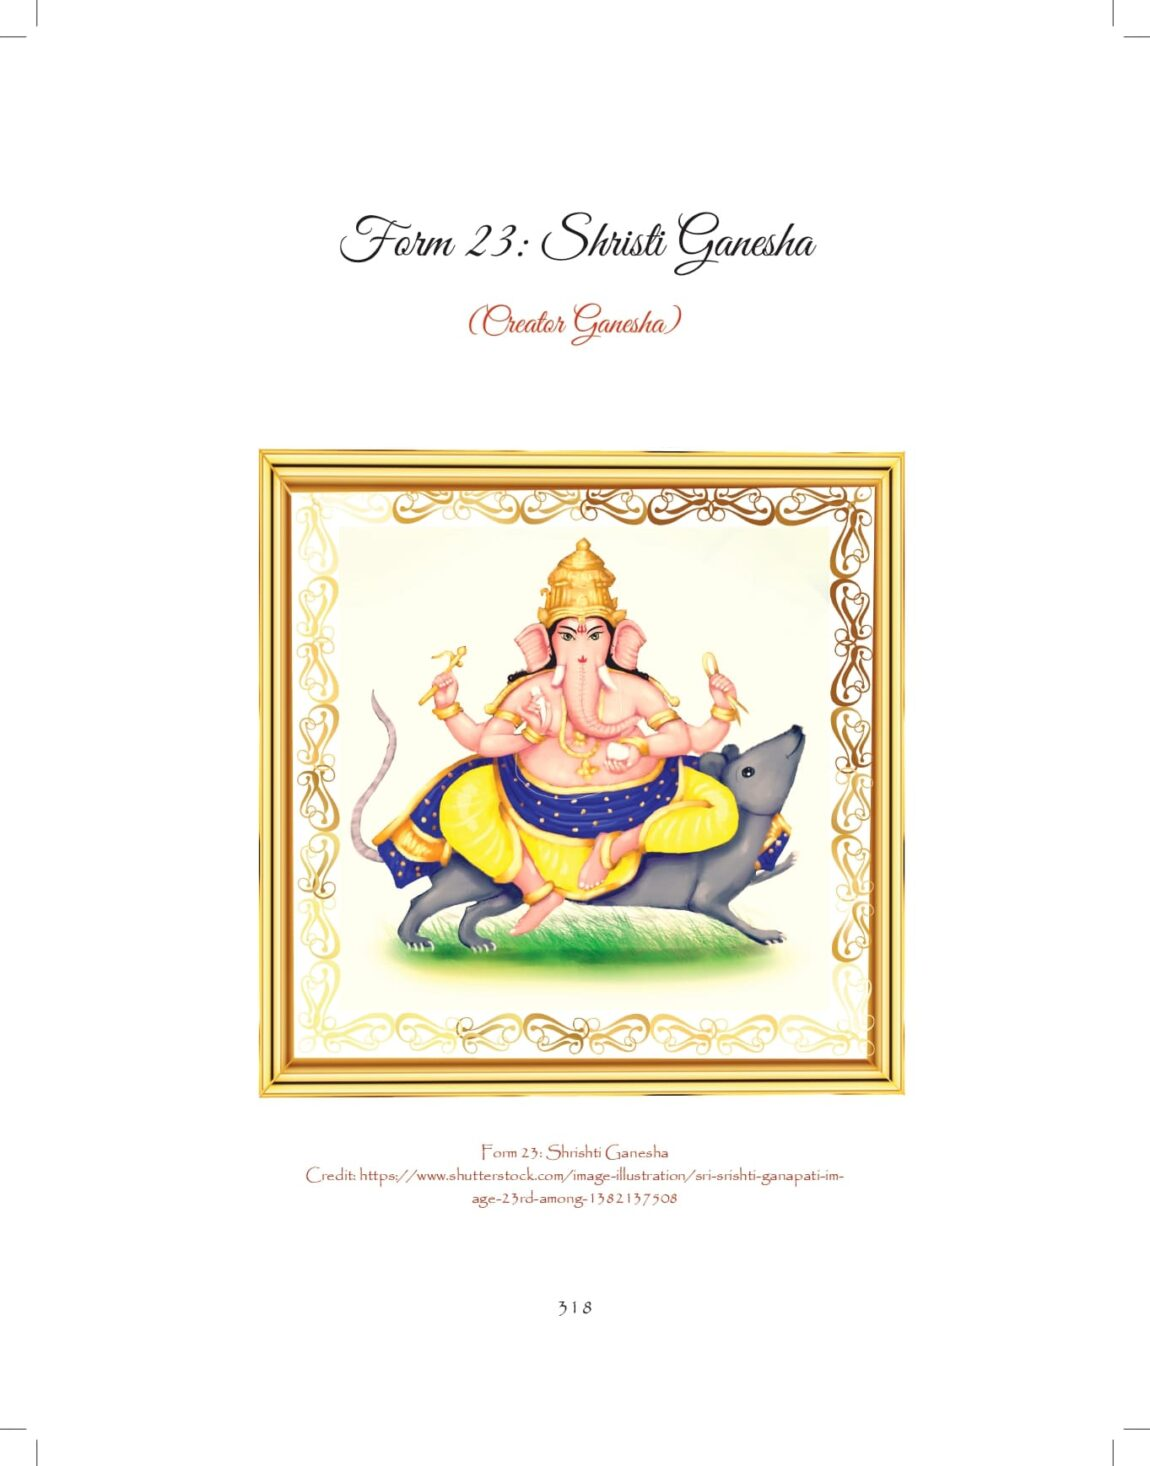 Ganesh-print_pages-to-jpg-0318.jpg